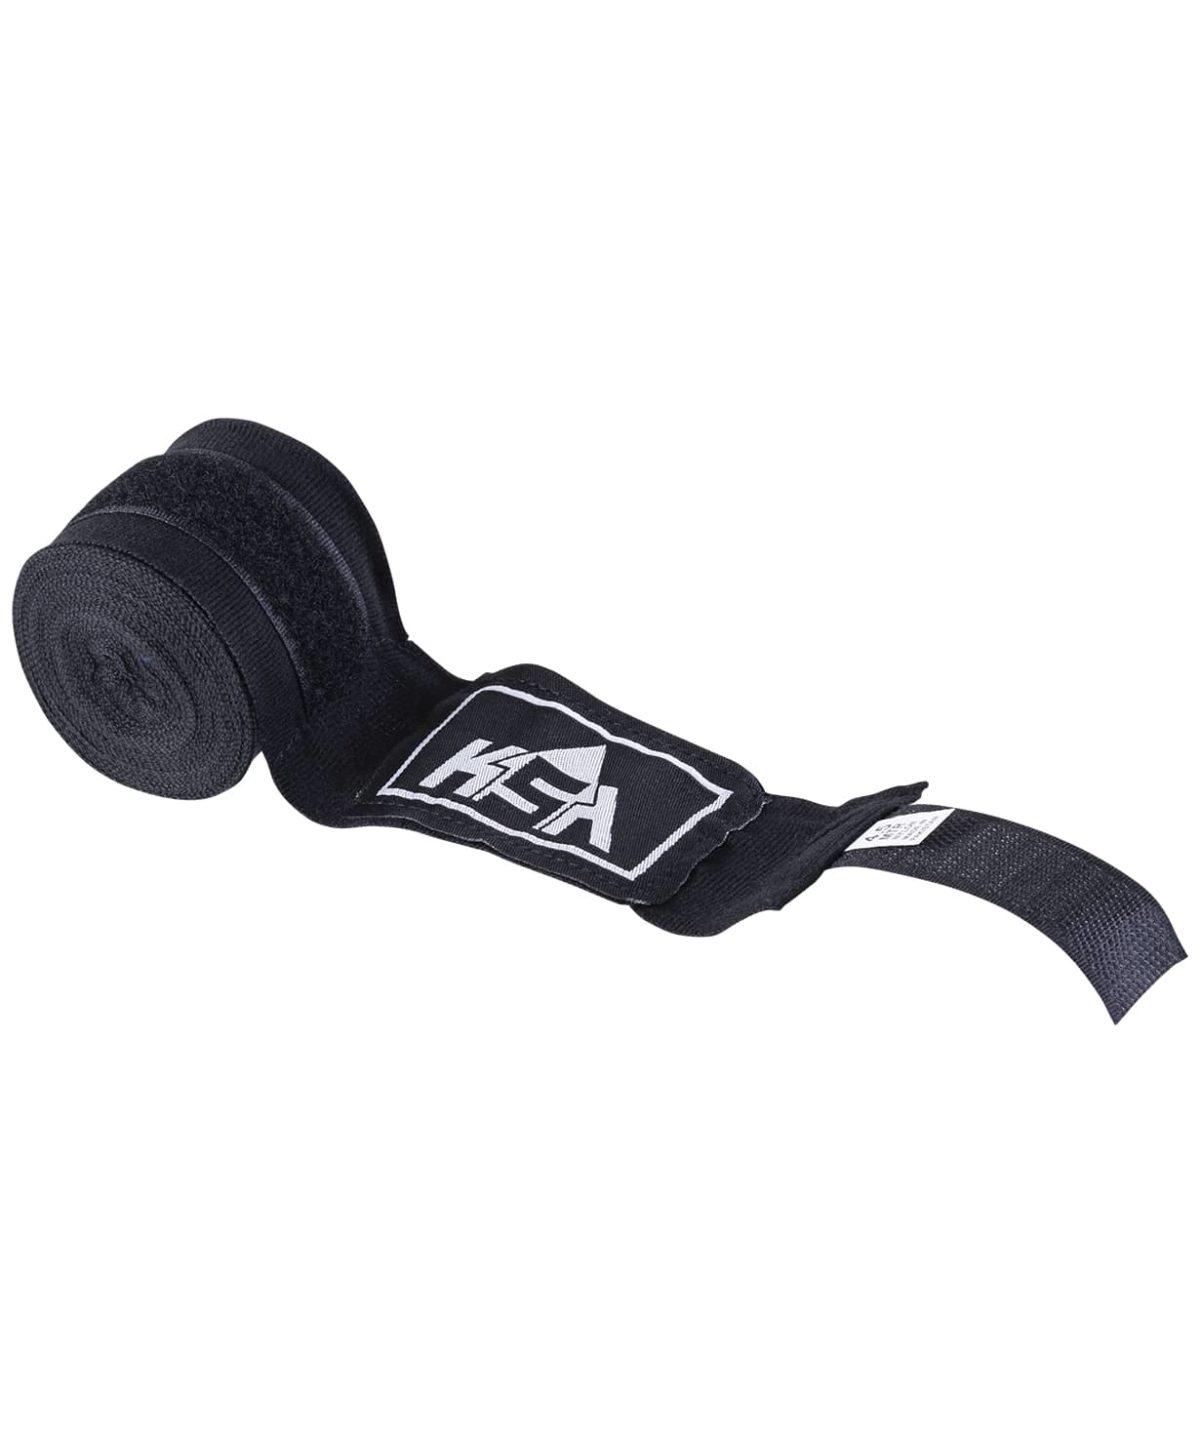 KSA Бинт боксерский, хлопок/полиэстер, 2.5 м Hunter Black  1788 - 1